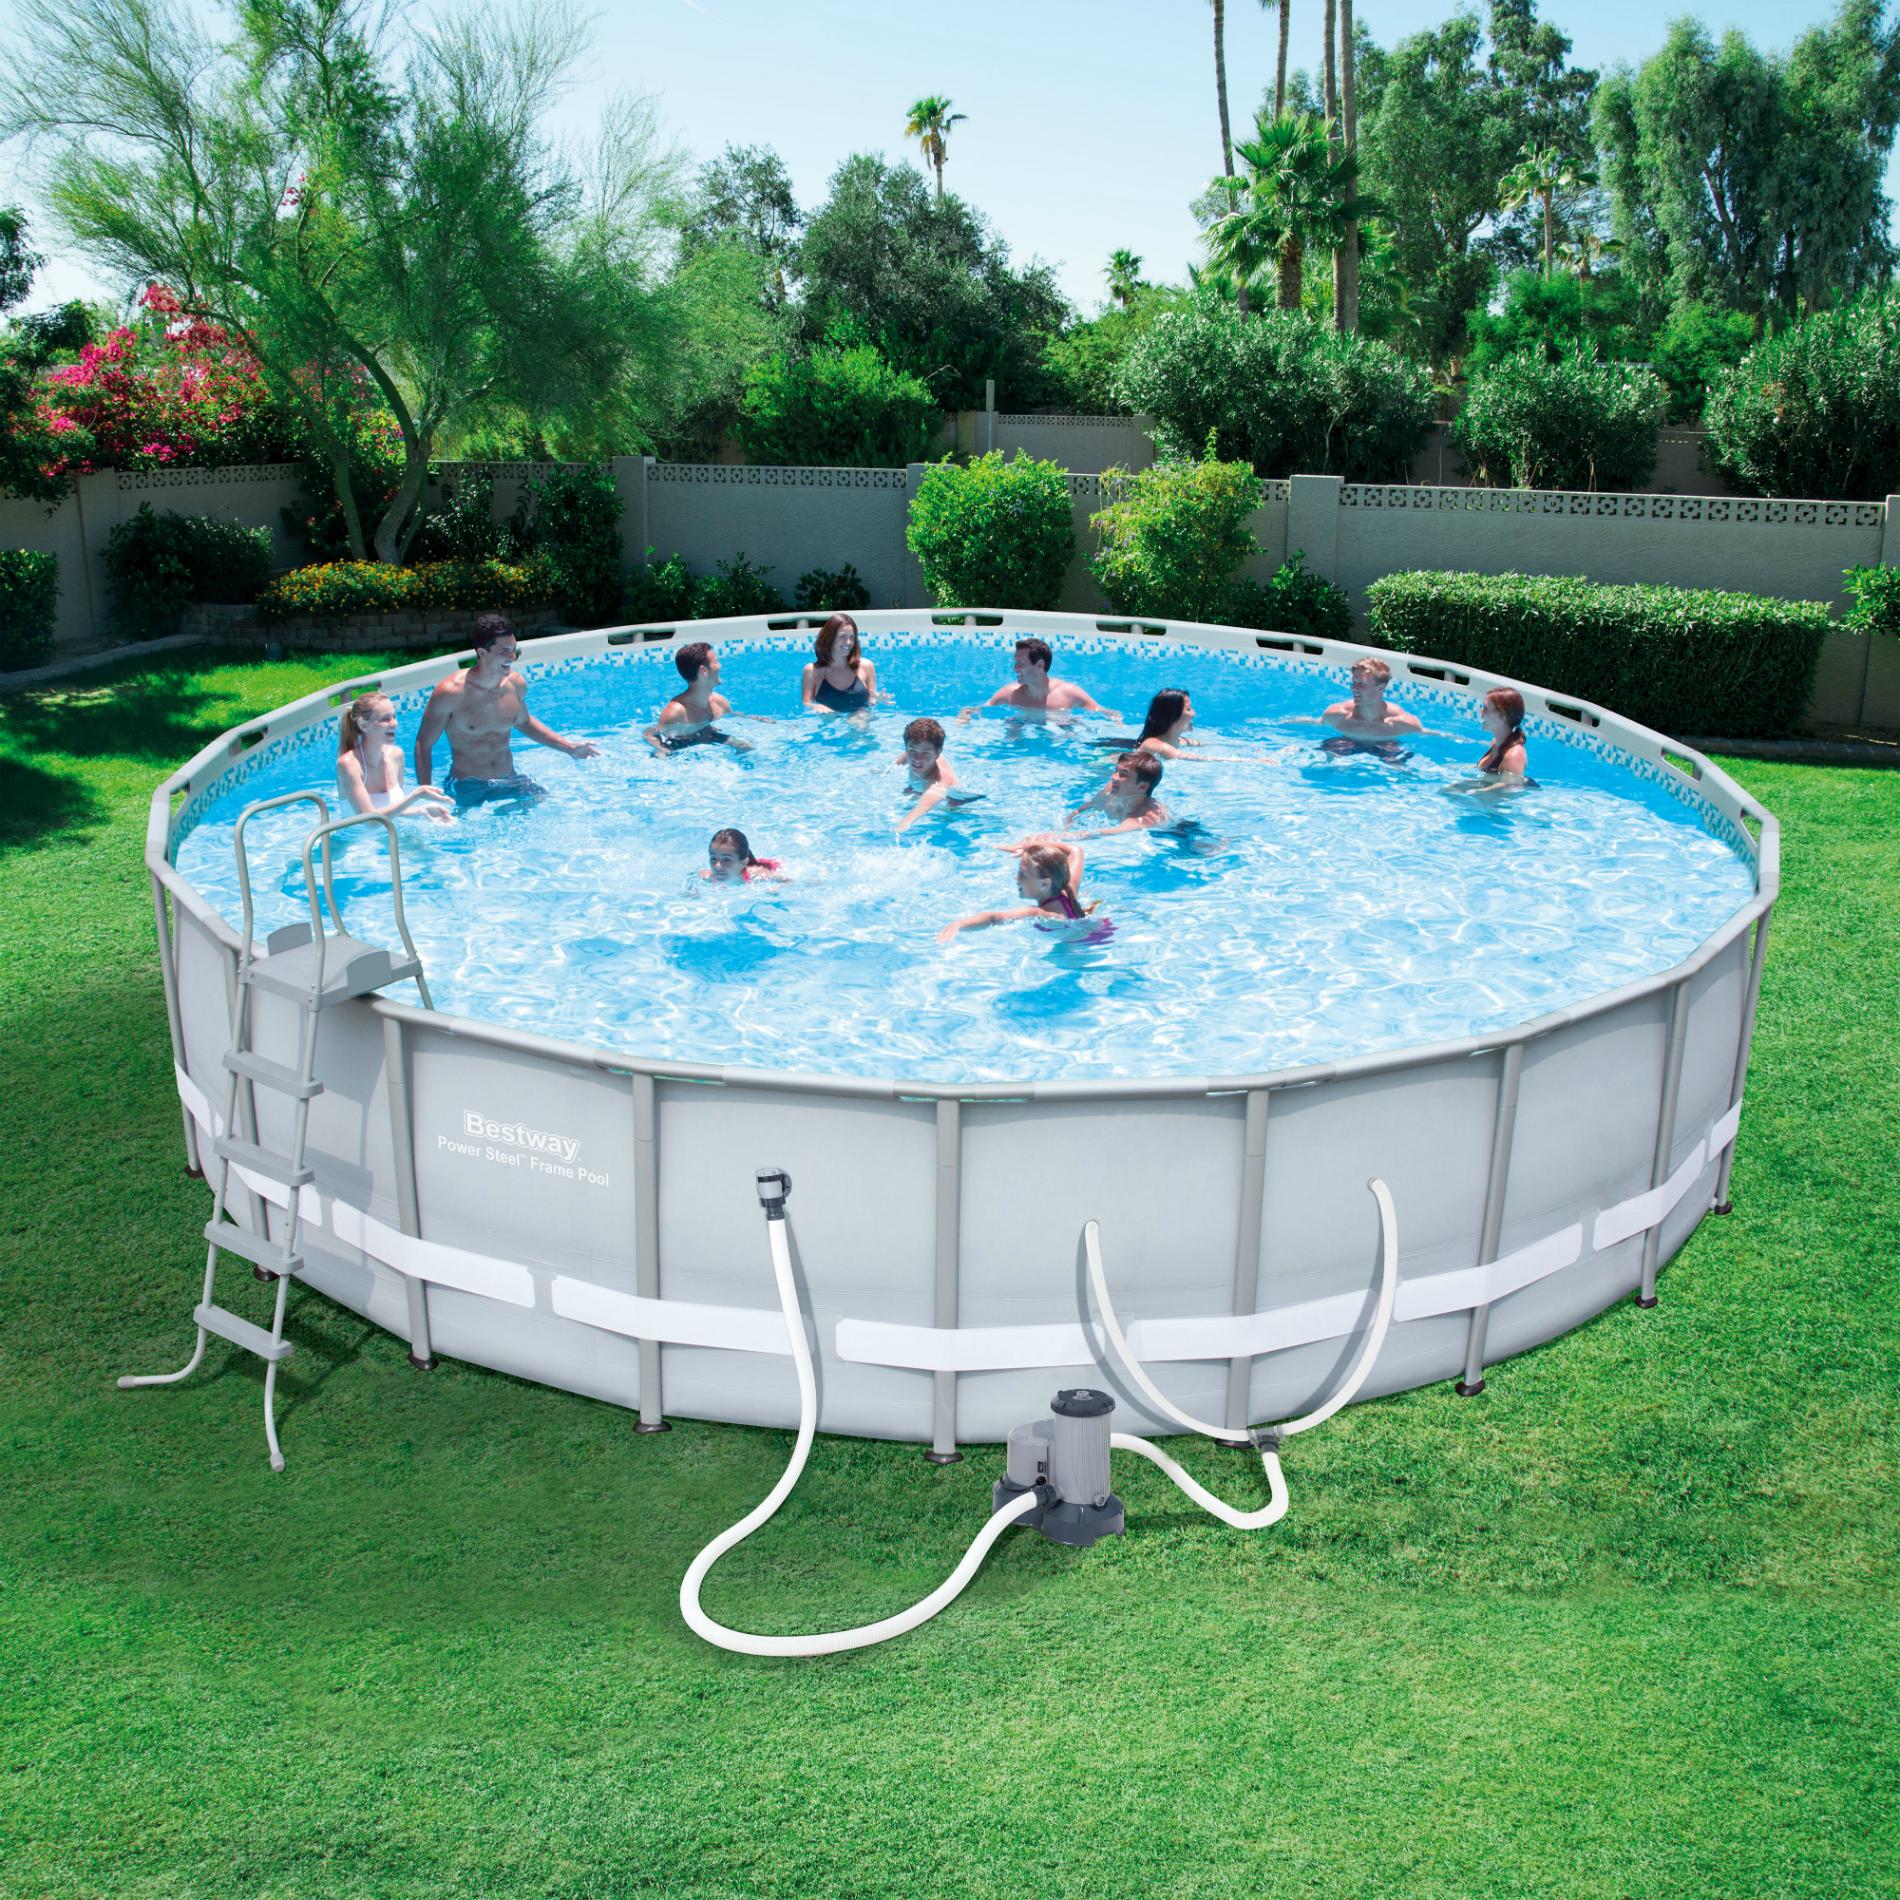 Bestway 22 X 52 Round Power Steela Frame Pool Set Best Above Ground Pool Swimming Pool Accessories Coleman Pool